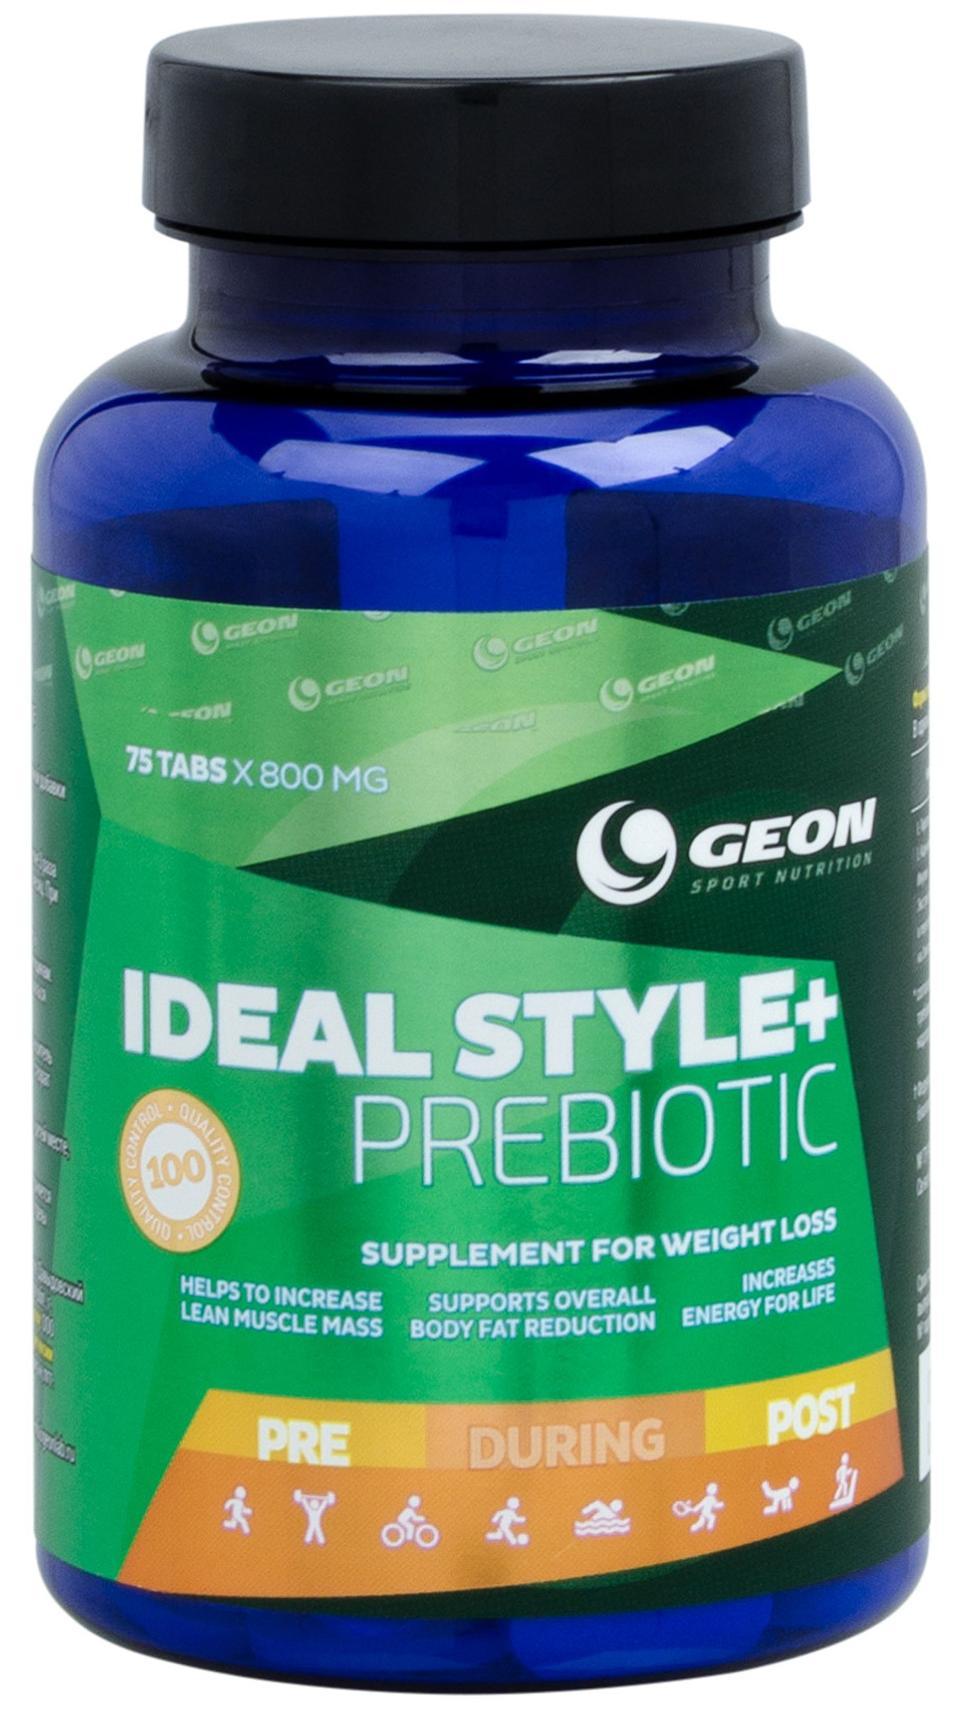 Ideal Style + prebiotik, 75 таблеток, GEON